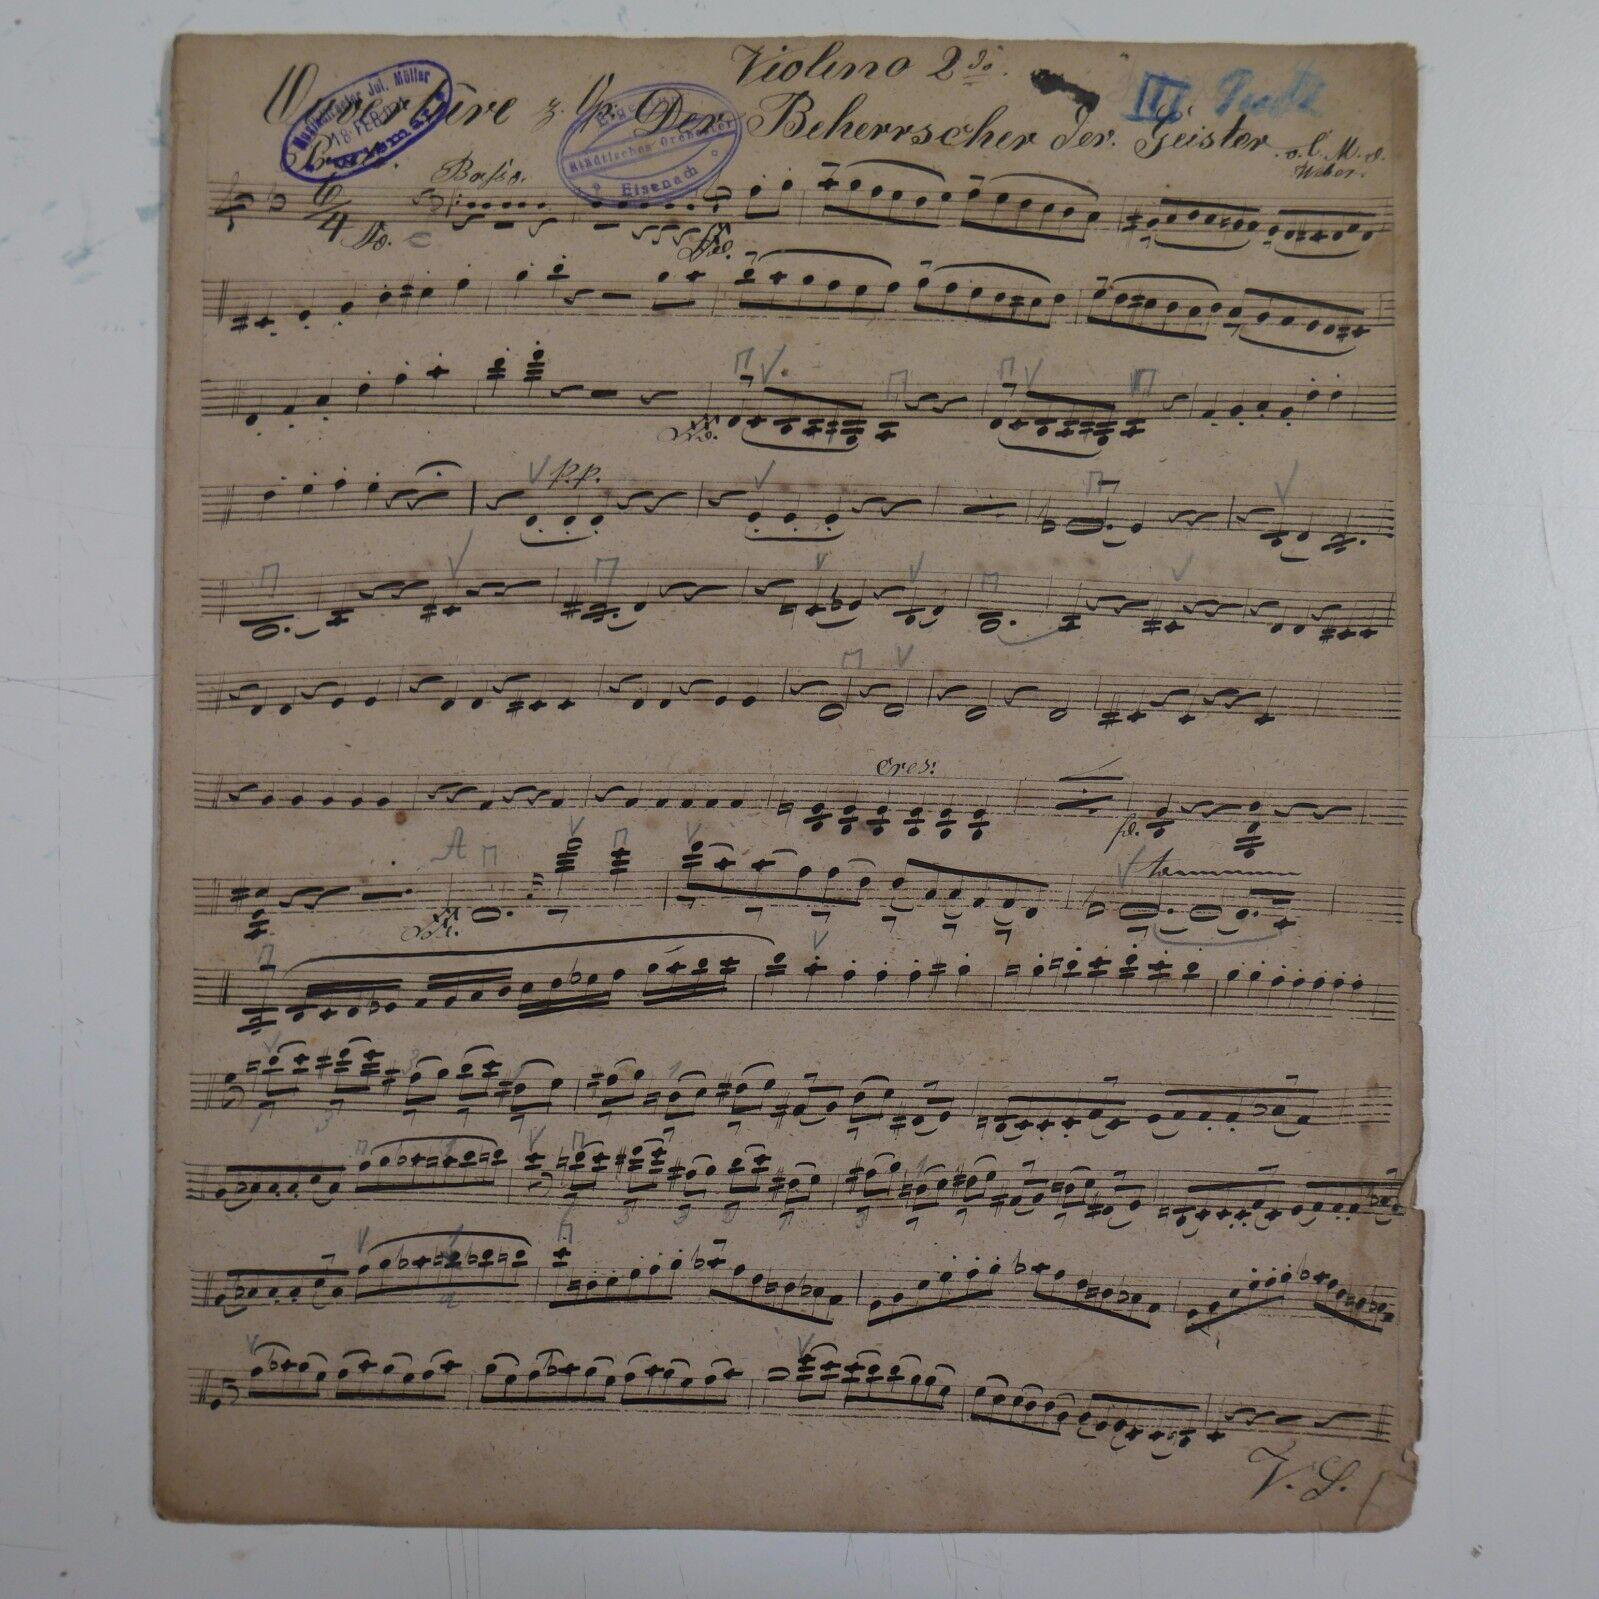 C M v WEBER DER BEHERRSCHER DER GEISTER violin 2 part , antiq music manuscript